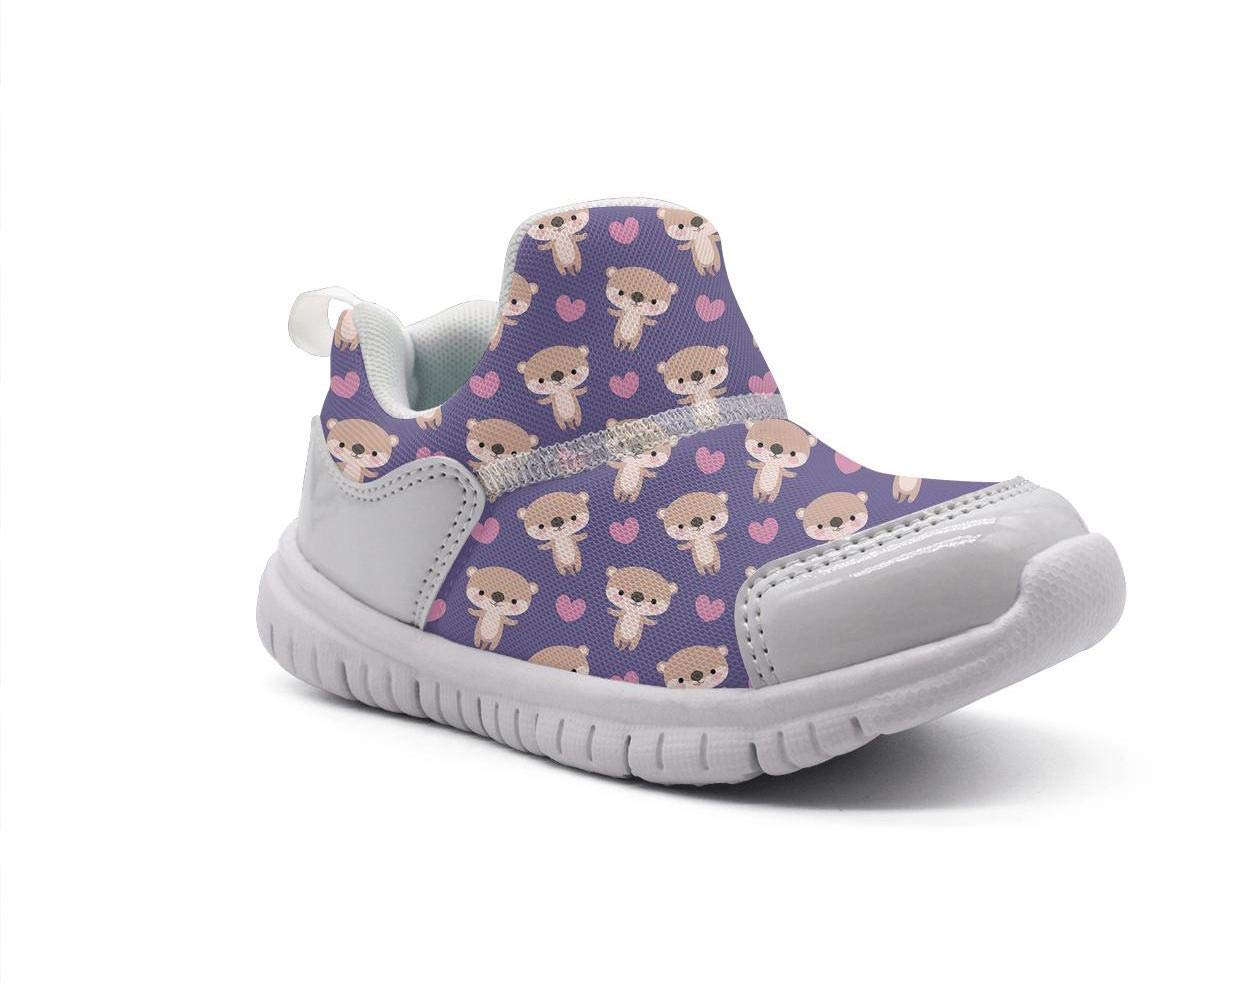 ONEYUAN Children Brown Bear Kid Casual Lightweight Sport Shoes Sneakers Running Shoes